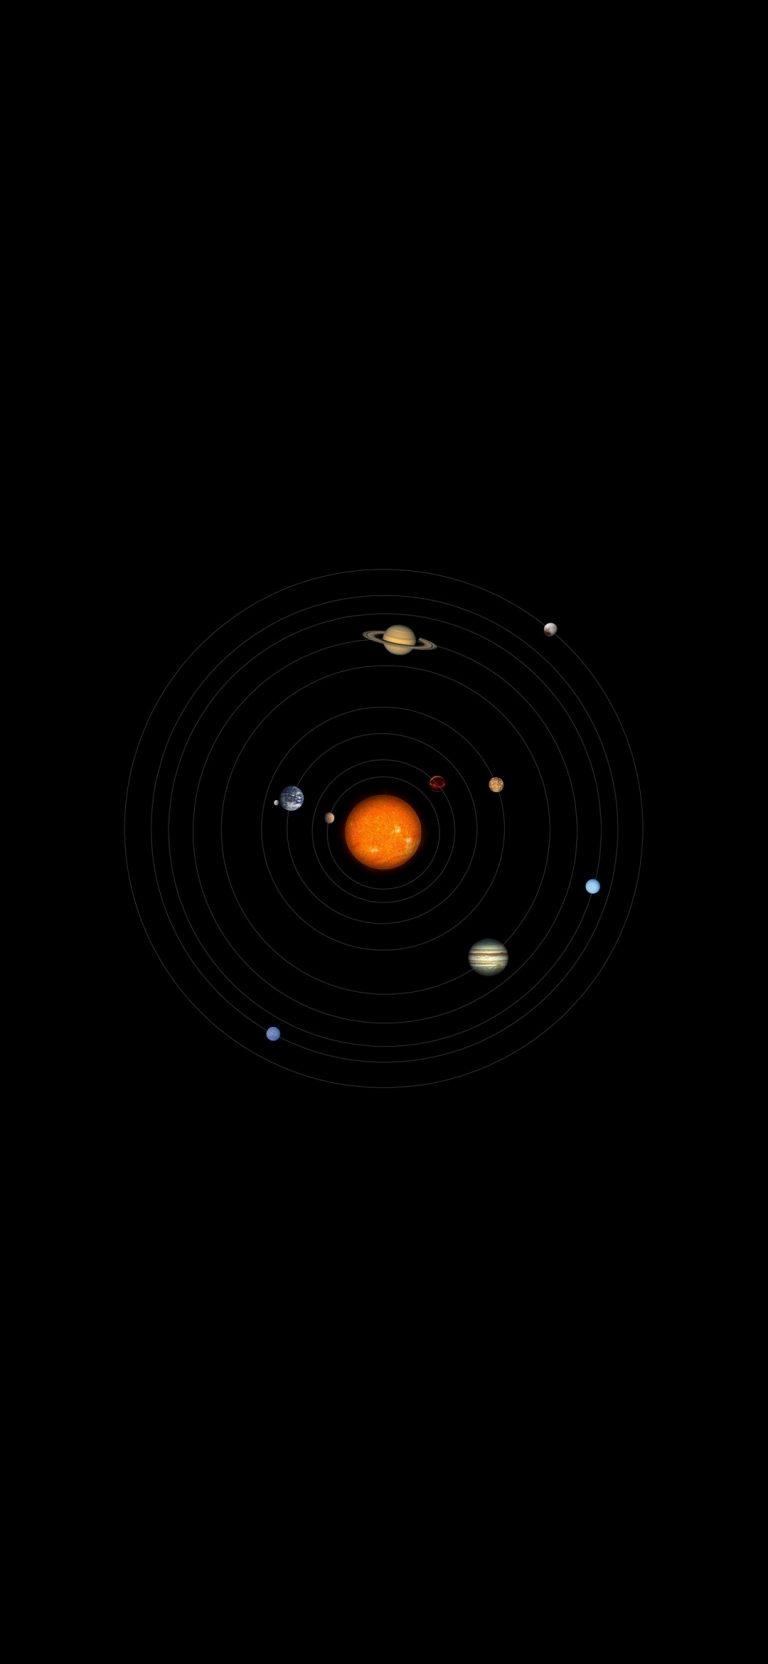 Space Phone Wallpaper 008 1080x2340 768x1664